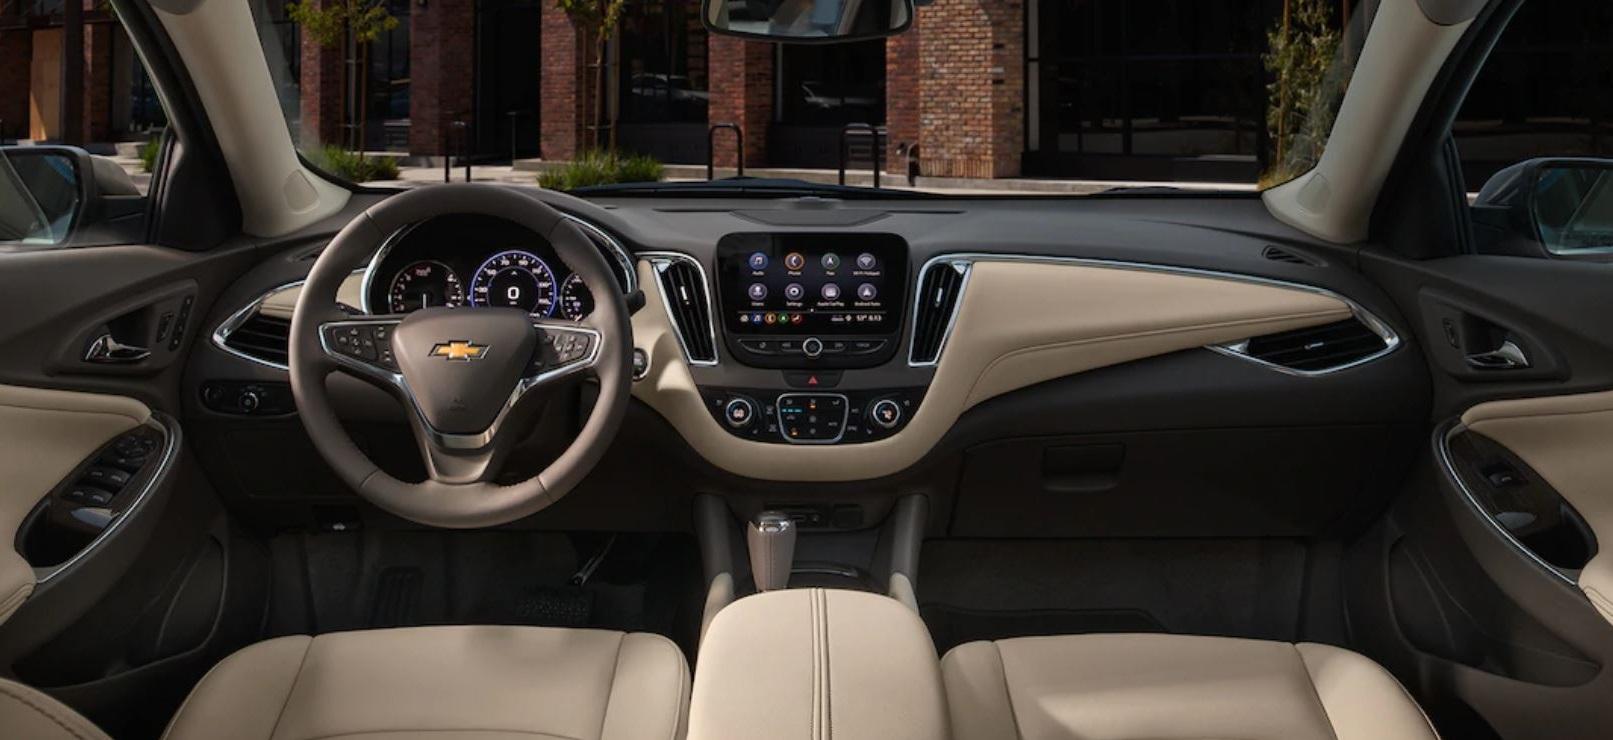 2019 Chevrolet Malibu for Sale near Carol Stream, IL - Kingdom Chevrolet